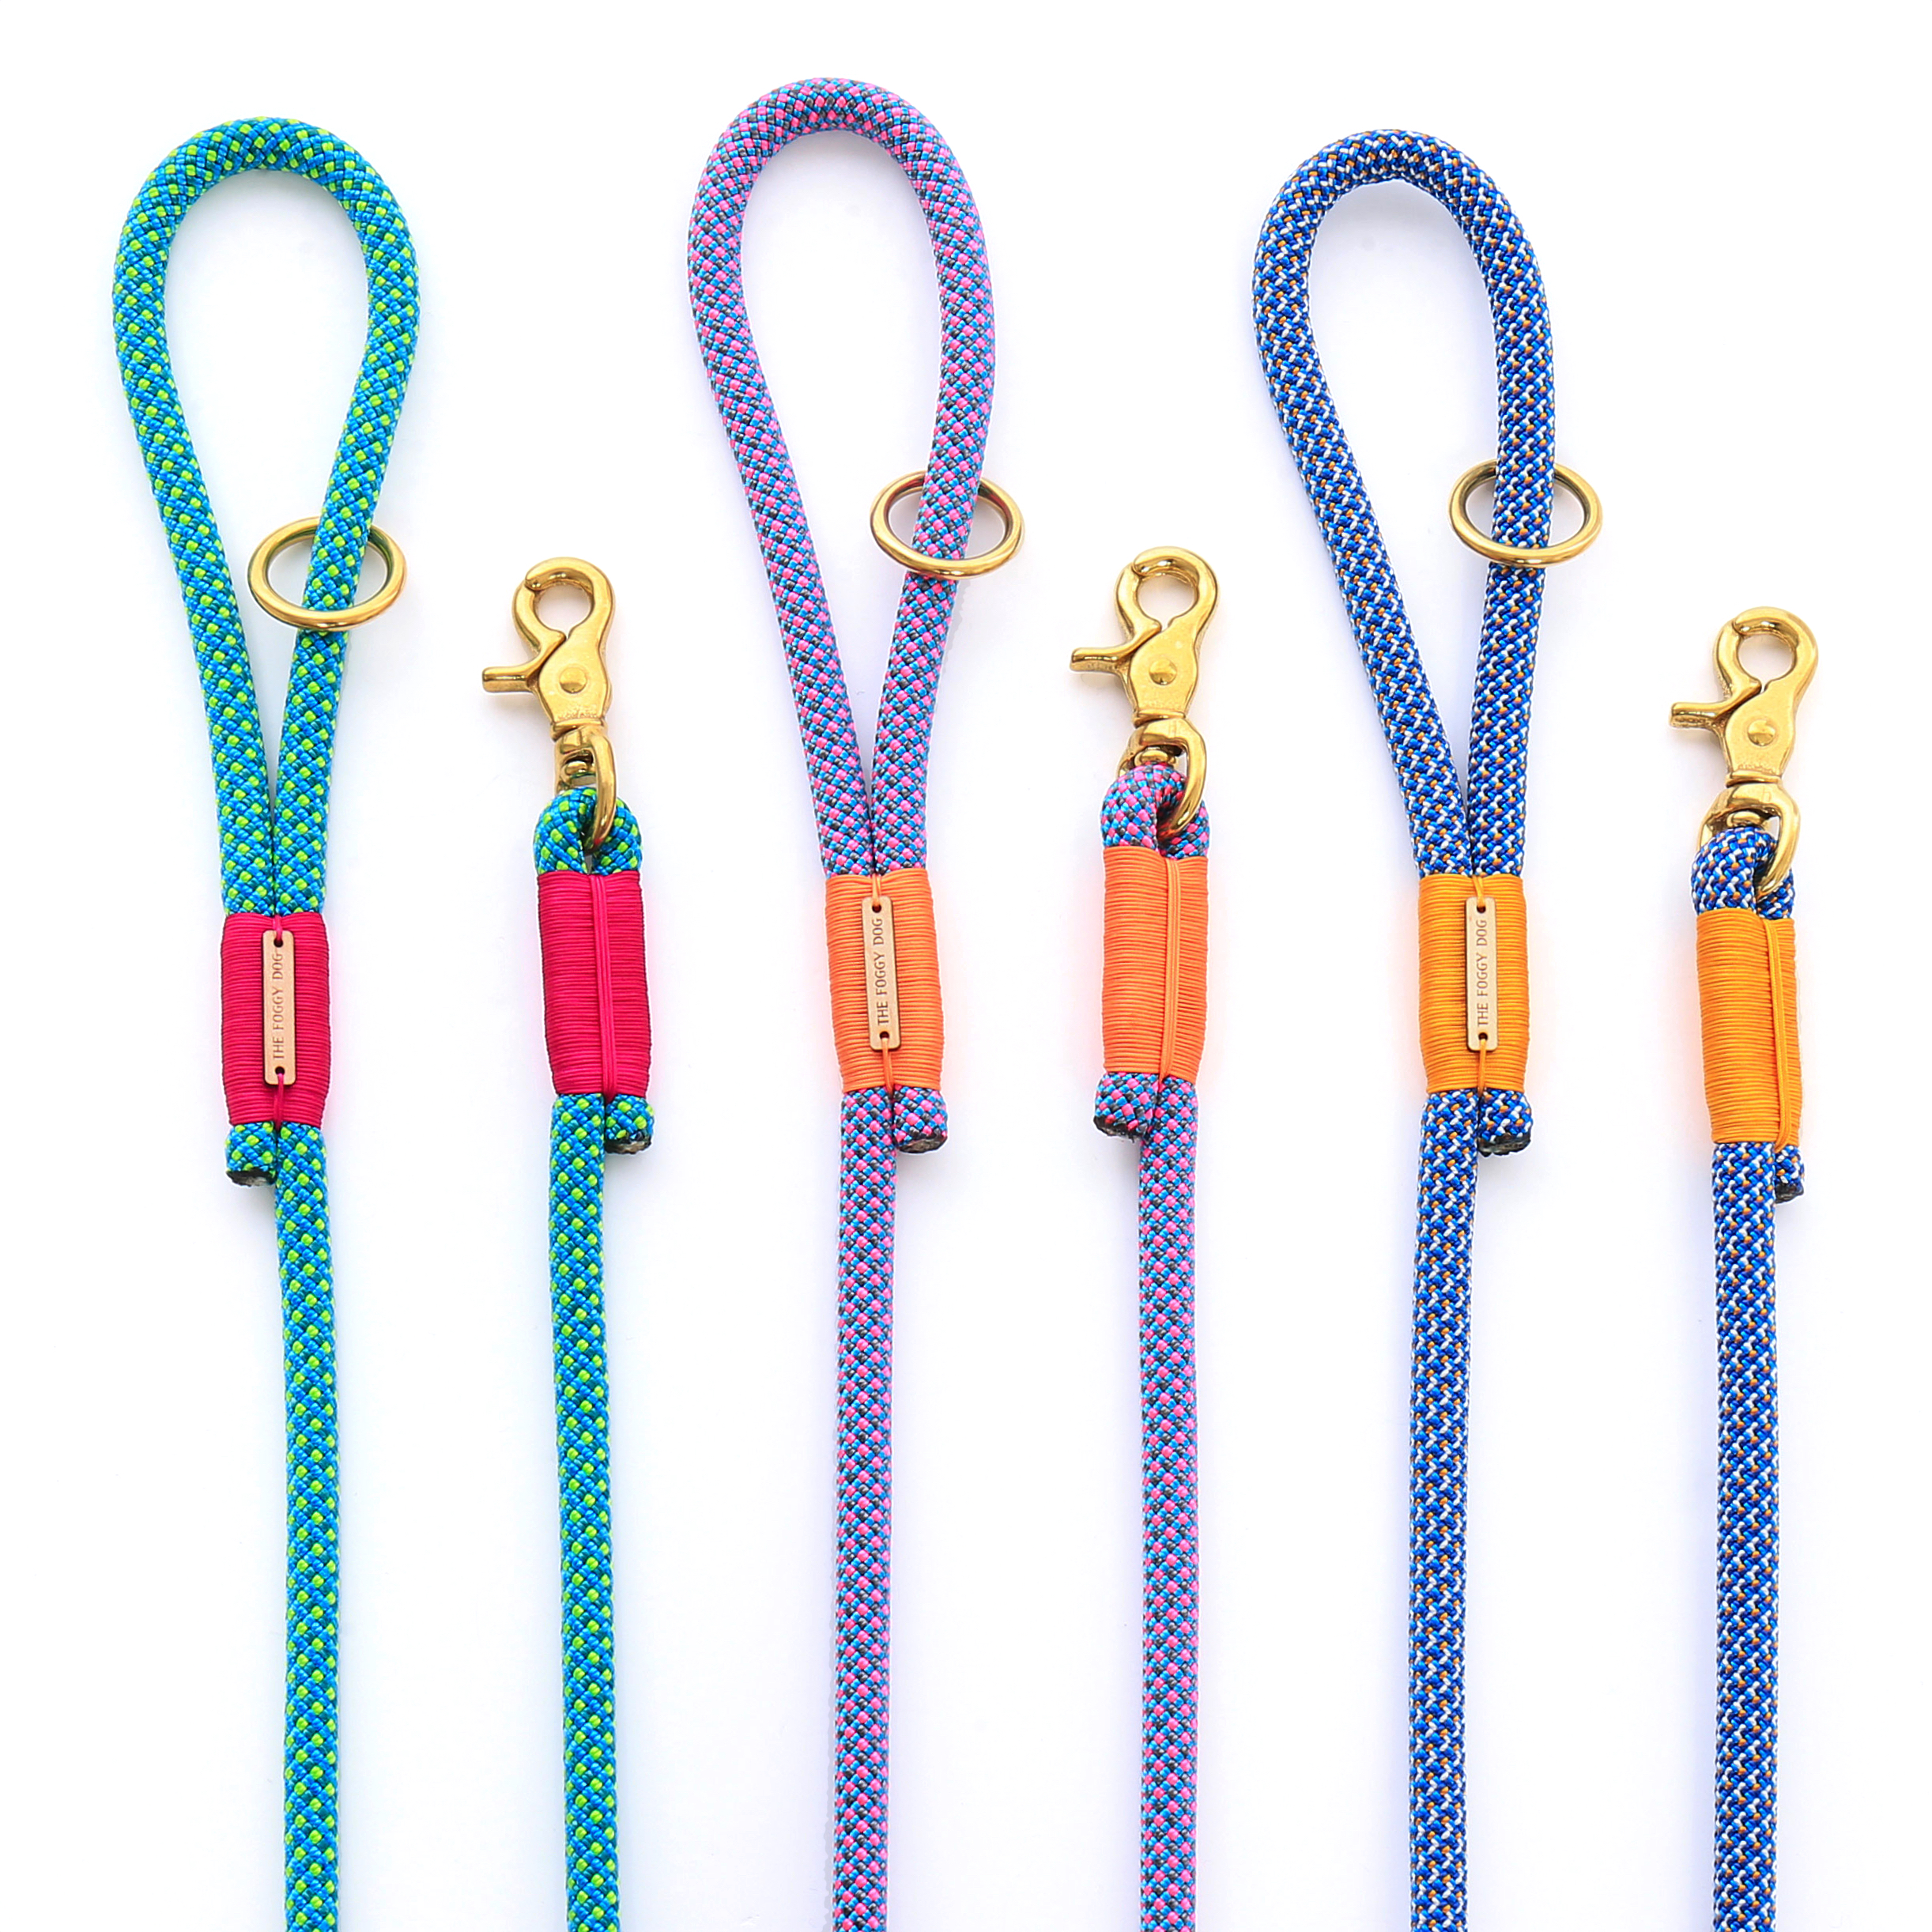 Climbing rope leashes x3.jpg